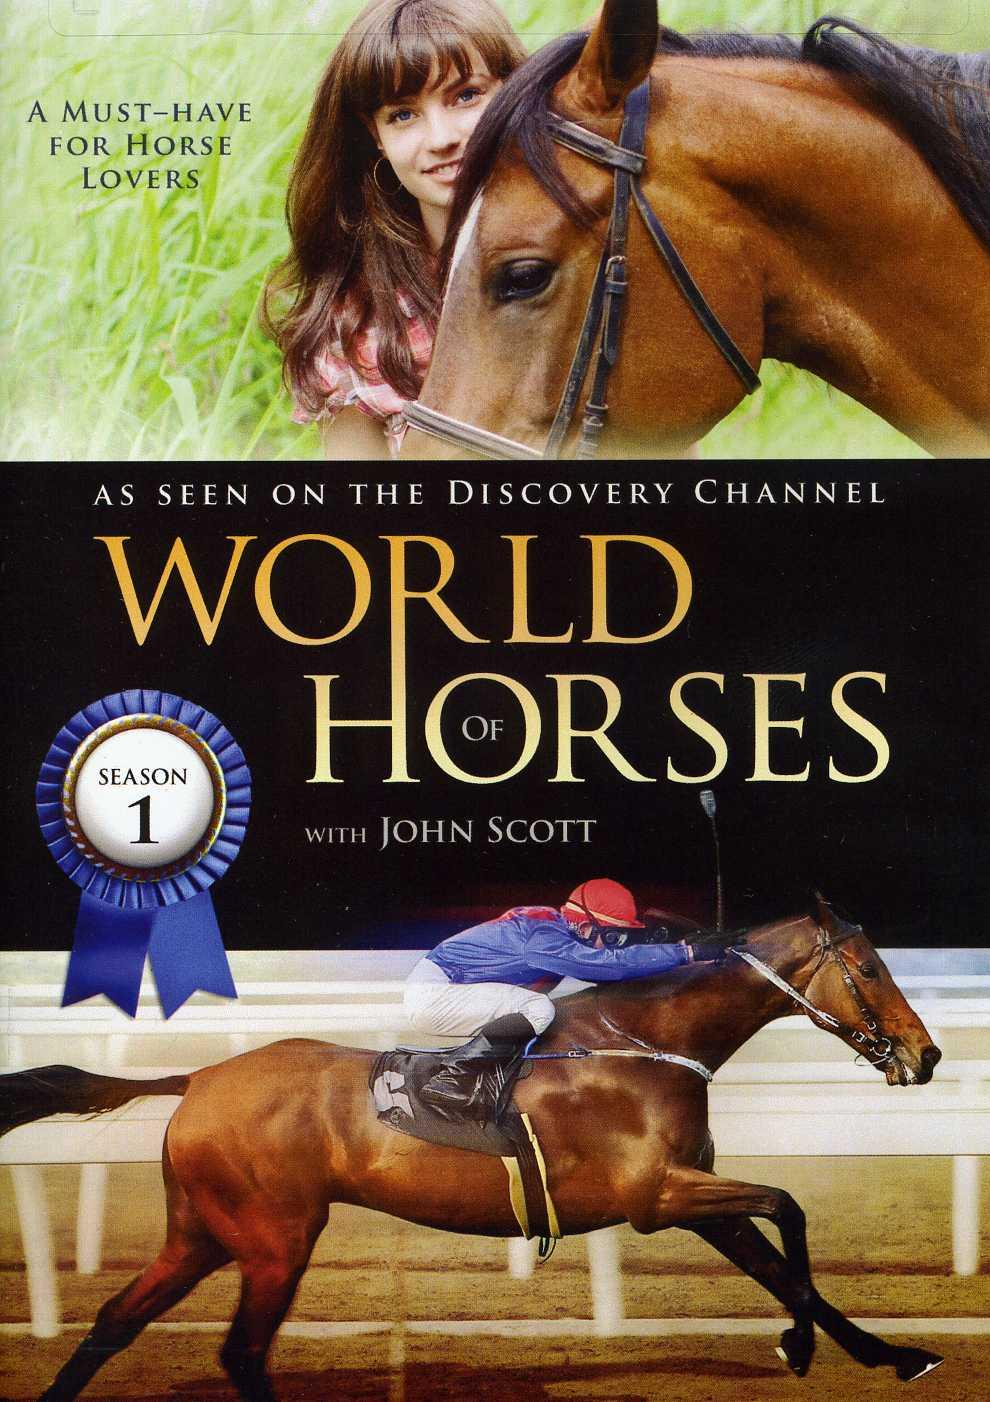 World Of Horses: Season 1 (DVD)